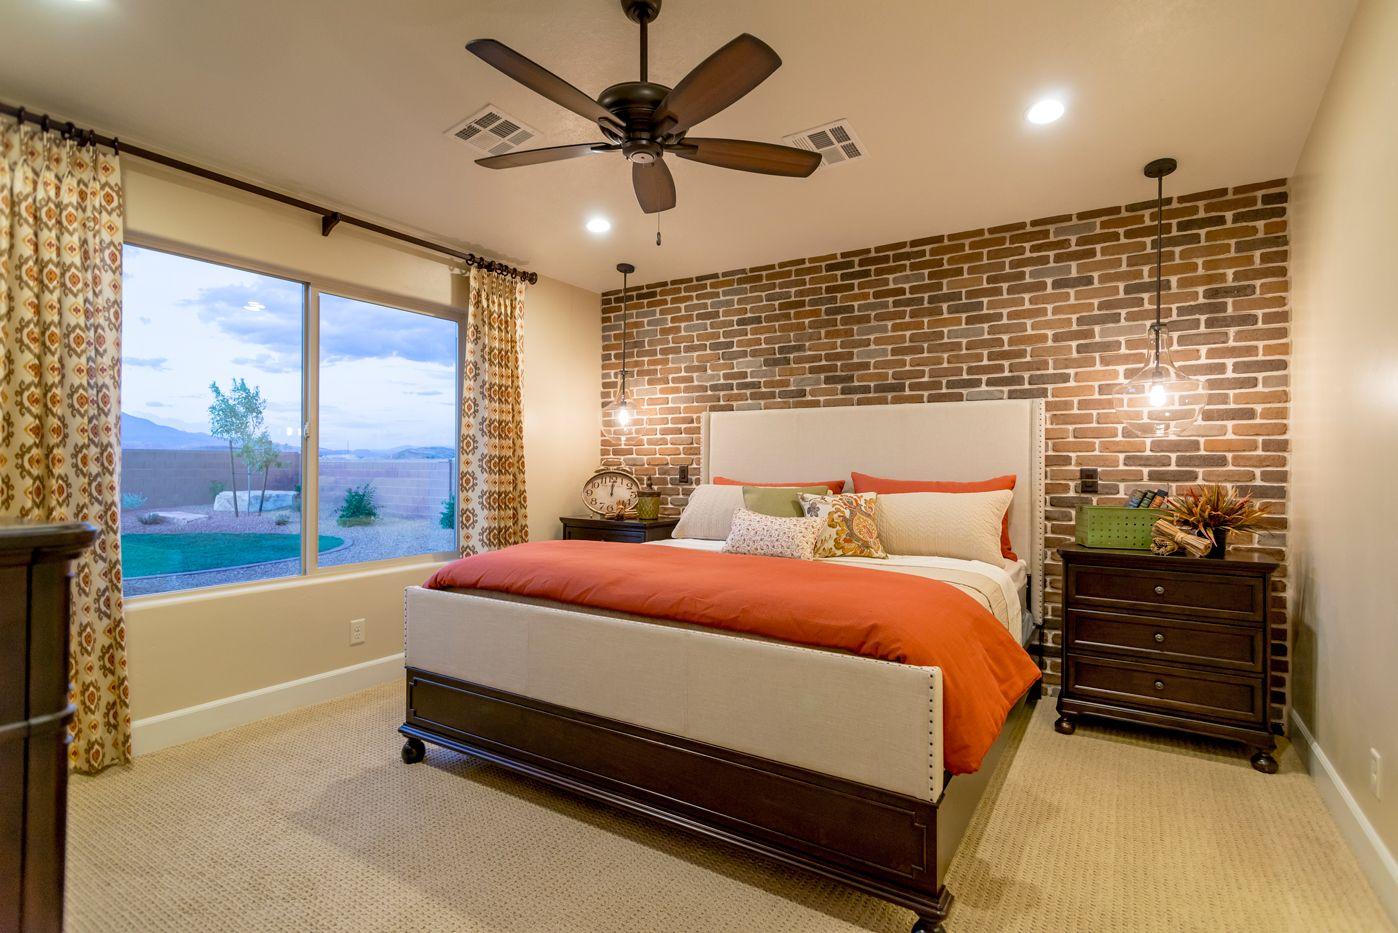 Bedroom featured in the Varano Vistas Plan 1872 By Ence Homes in St. George, UT